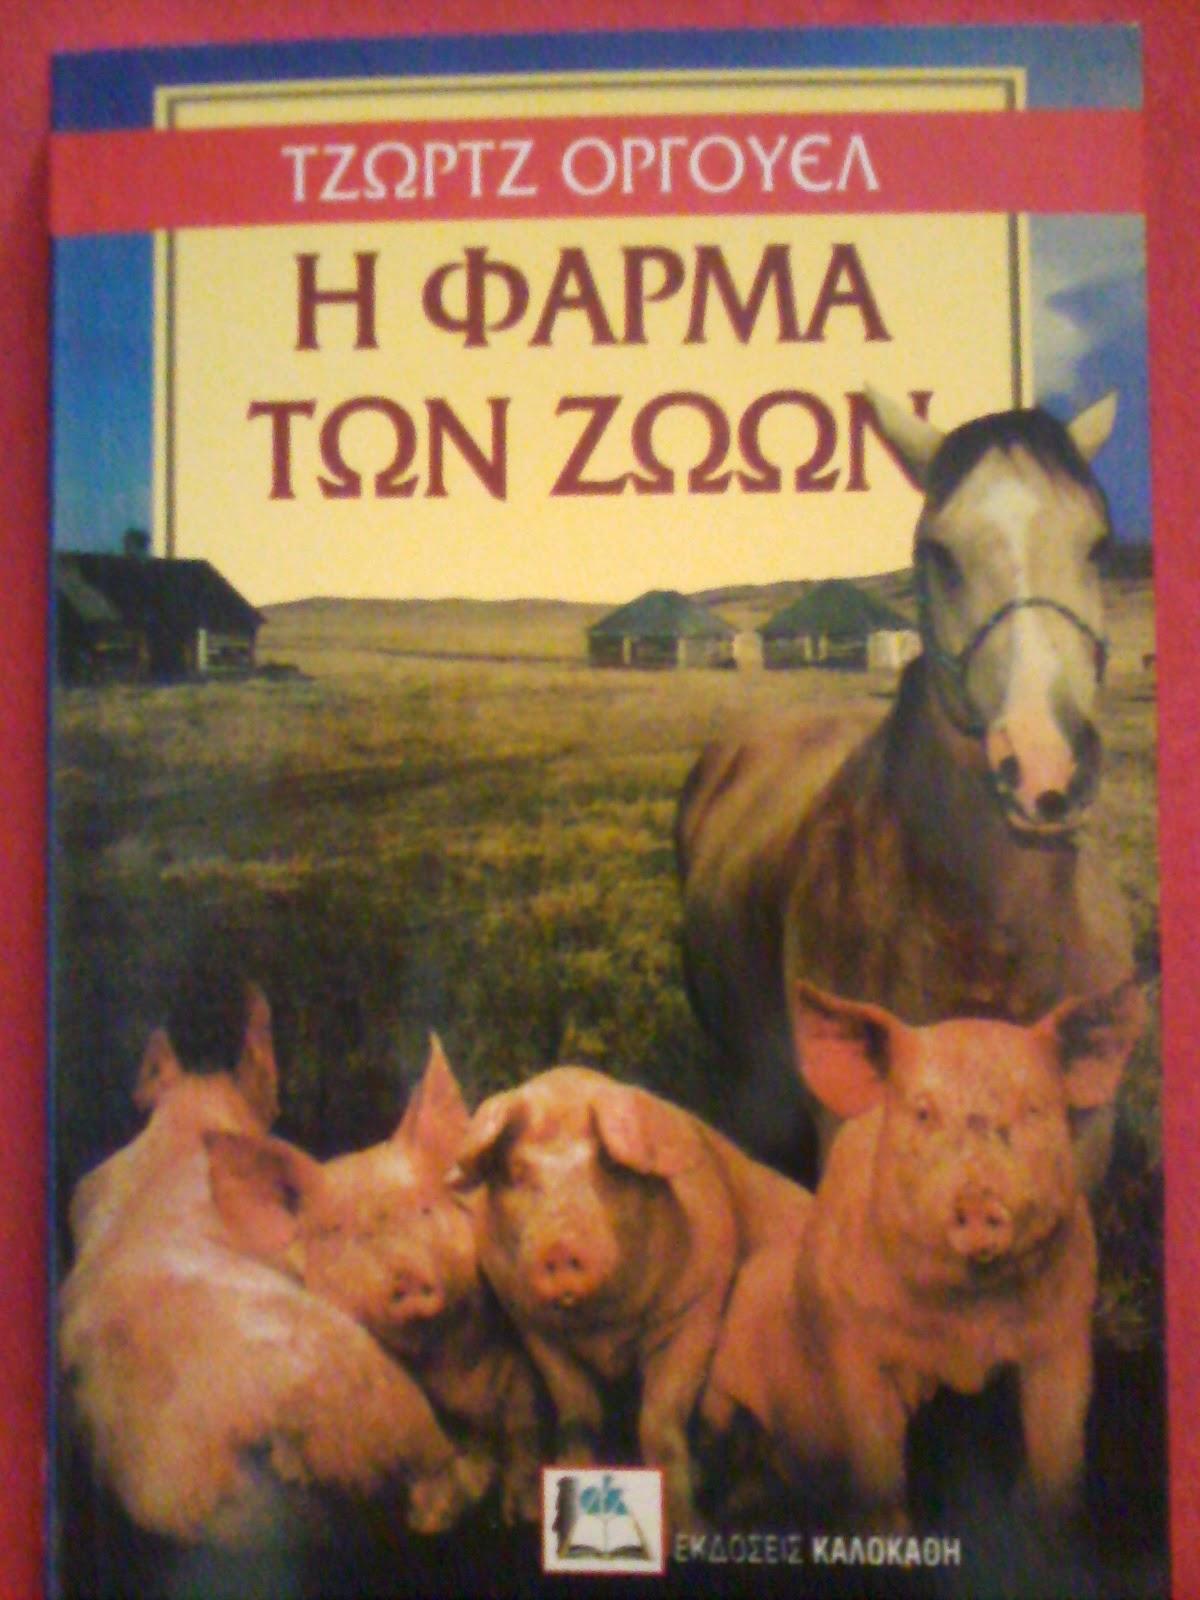 http://thalis-istologio.blogspot.gr/2014/09/animal-farm-george-orwell.html